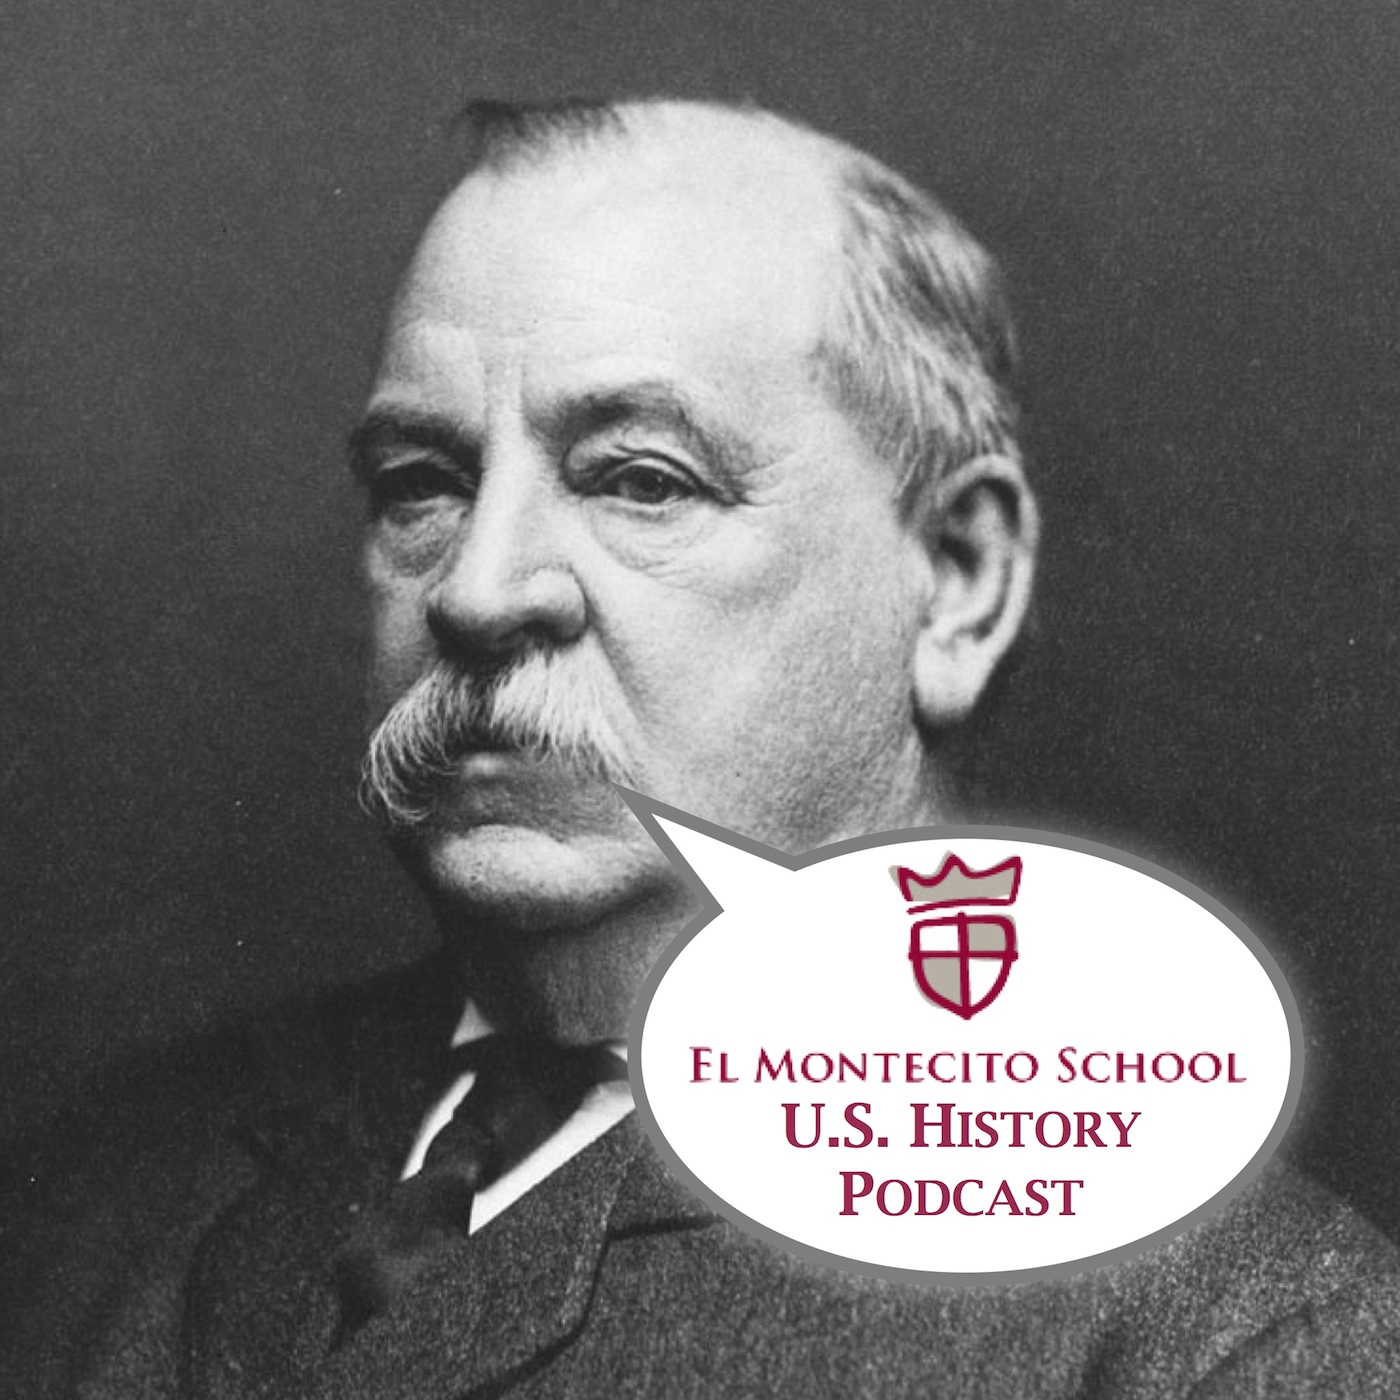 El Montecito U.S. History Podcast